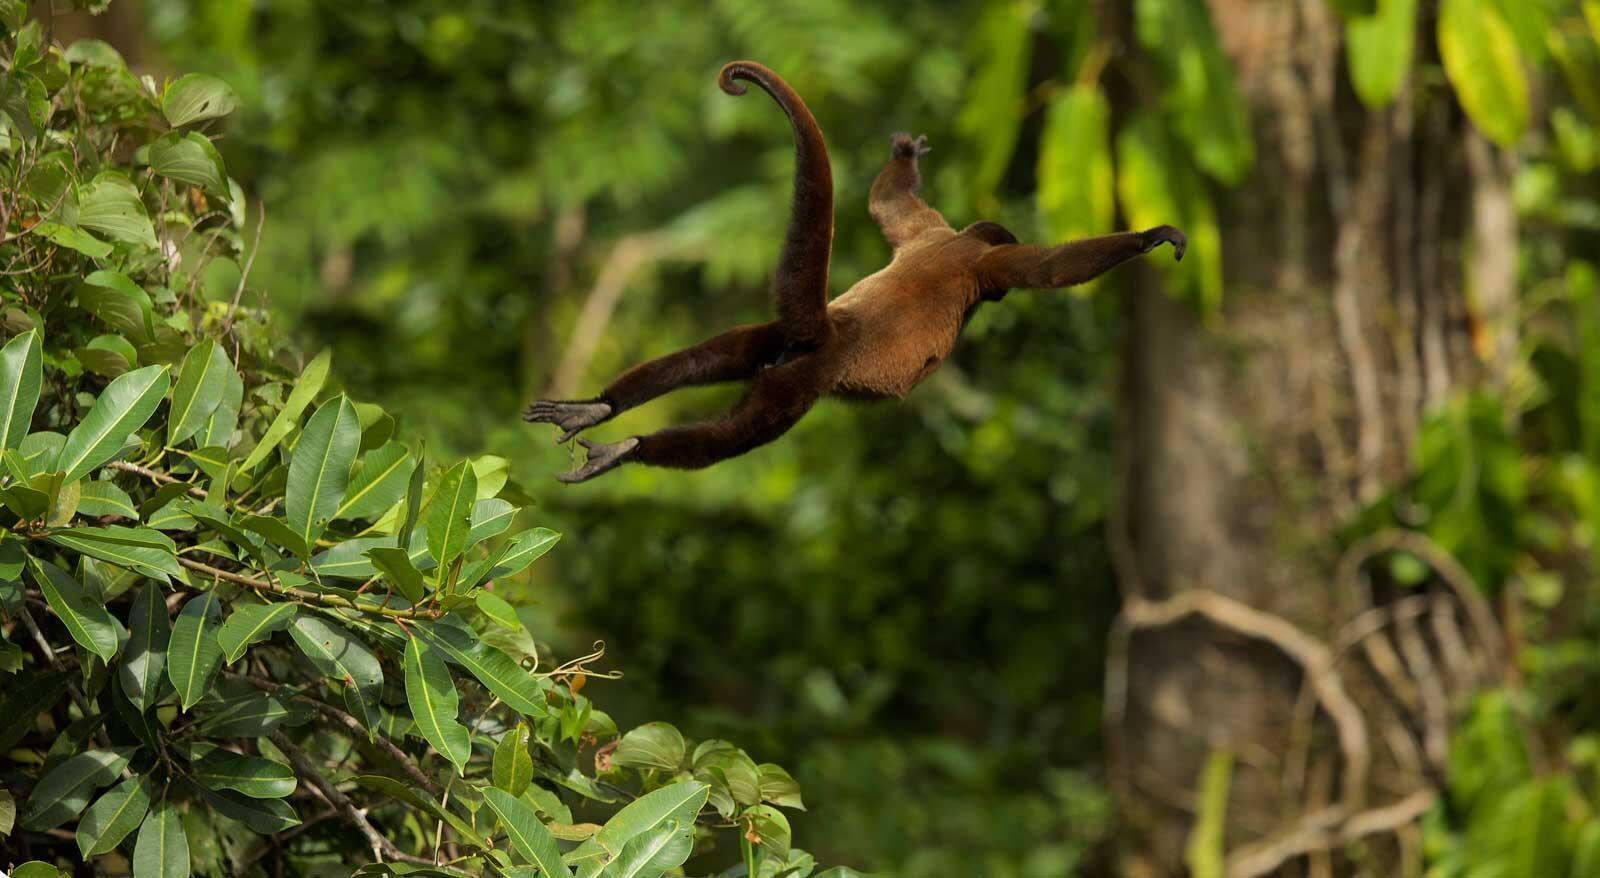 Silvery woolly monkey jumping